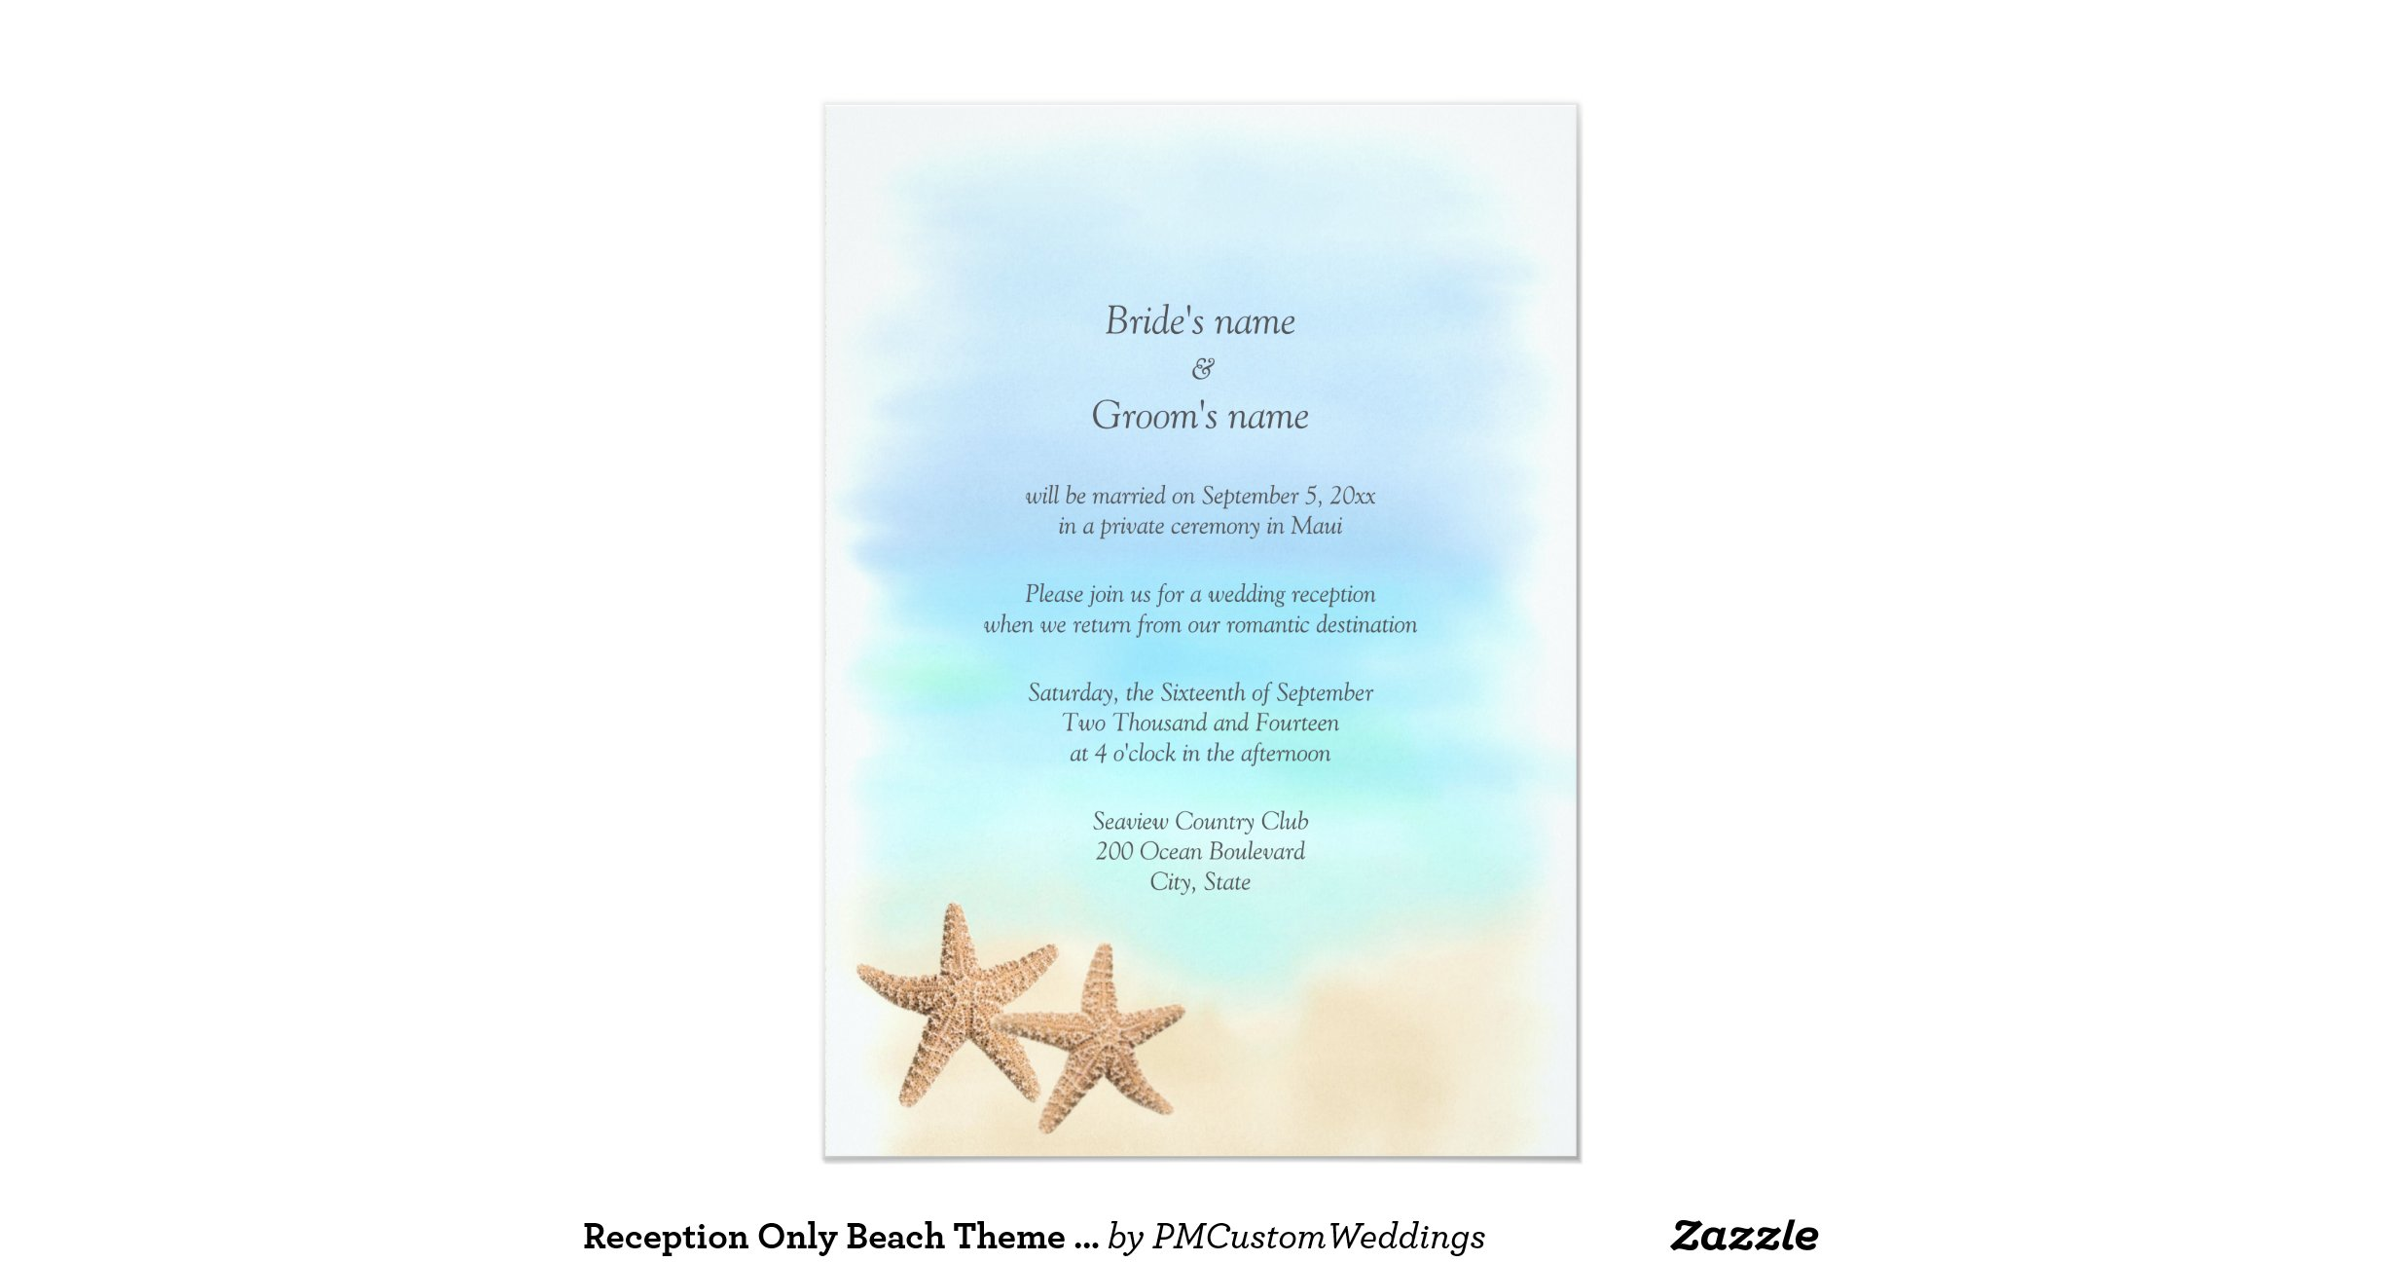 Beach Theme Wedding Invitation: Reception_only_beach_theme_wedding_invitations